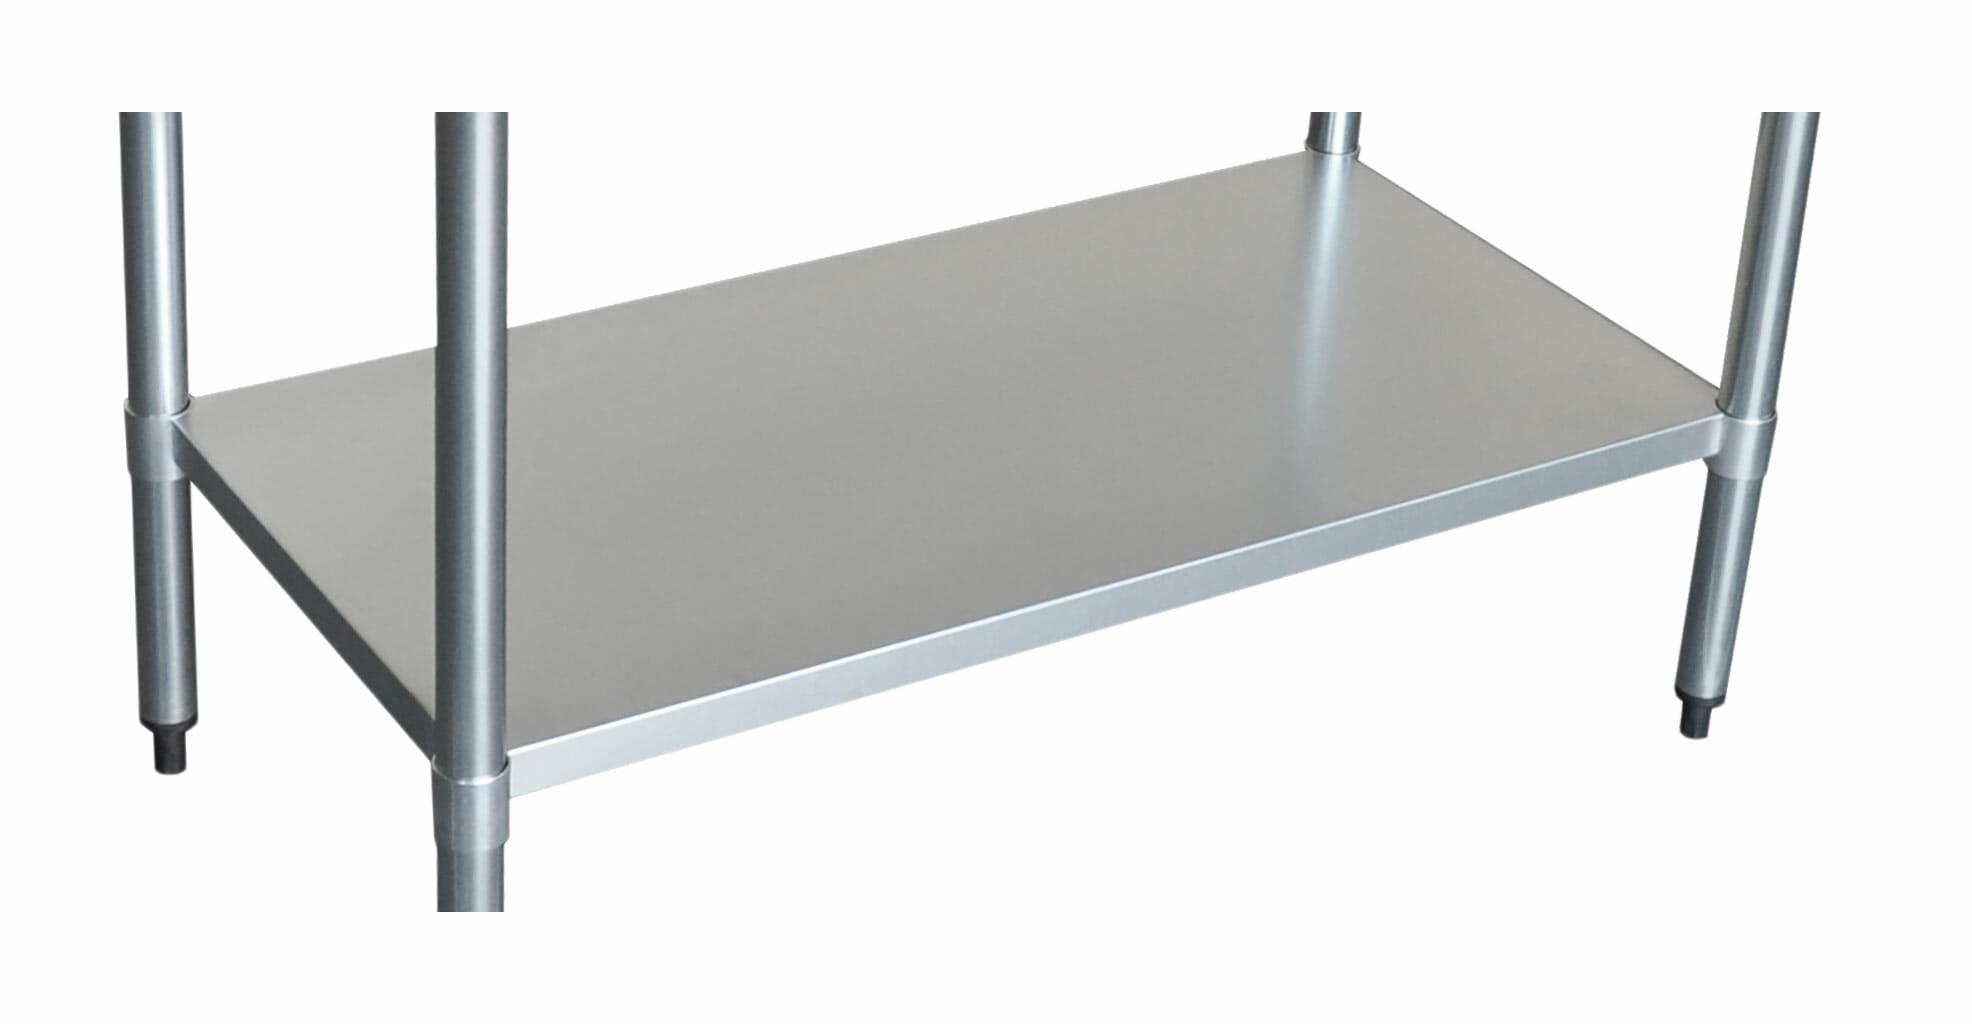 Stainless Undershelf for 3096 Bench